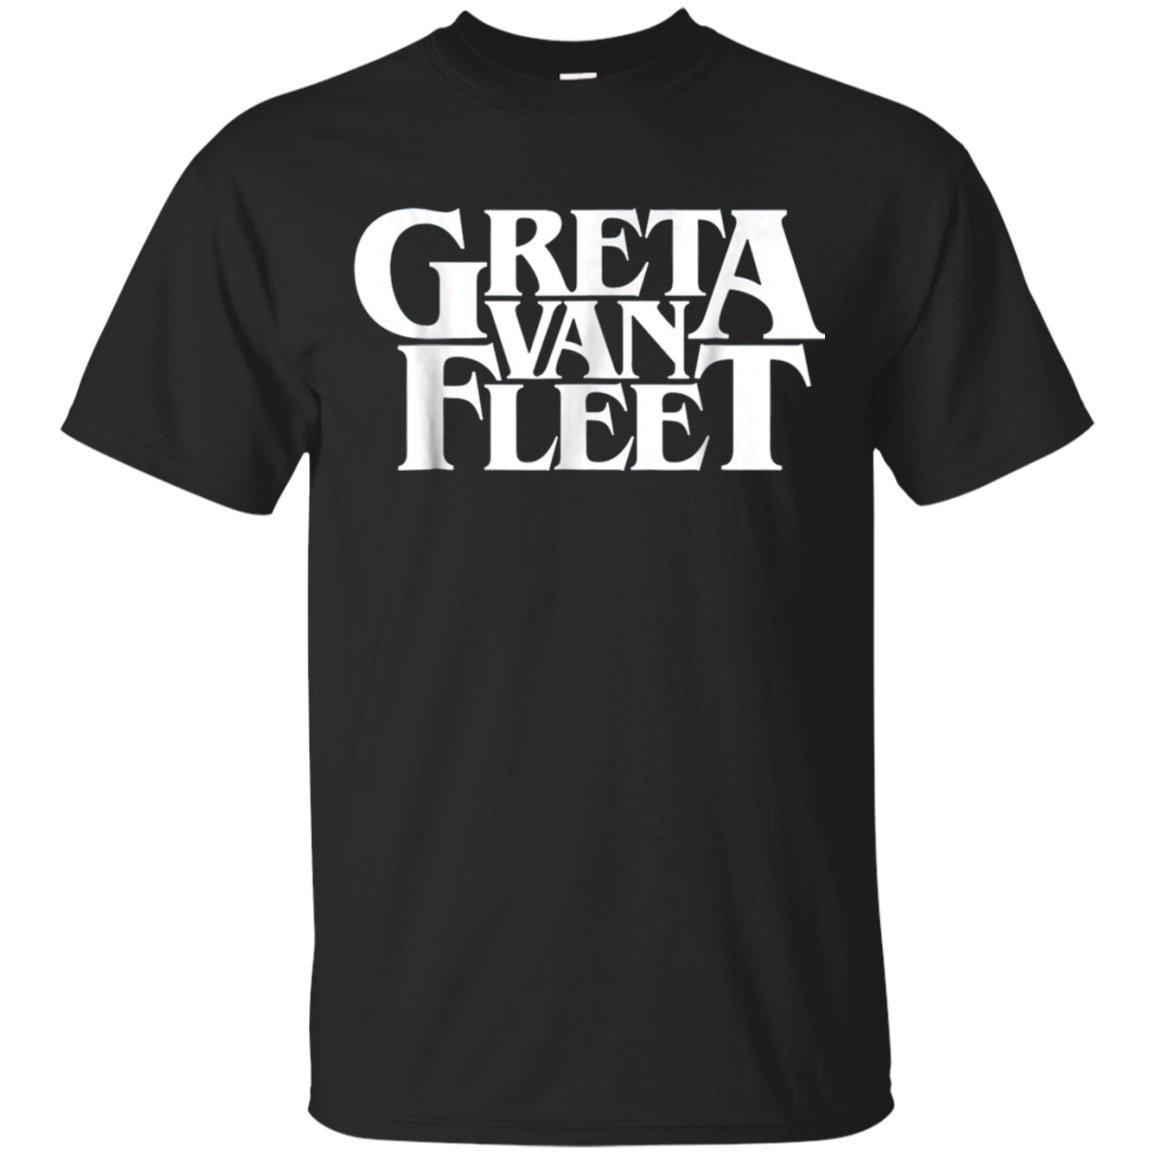 Greta Van Fleet Tshirt 4381